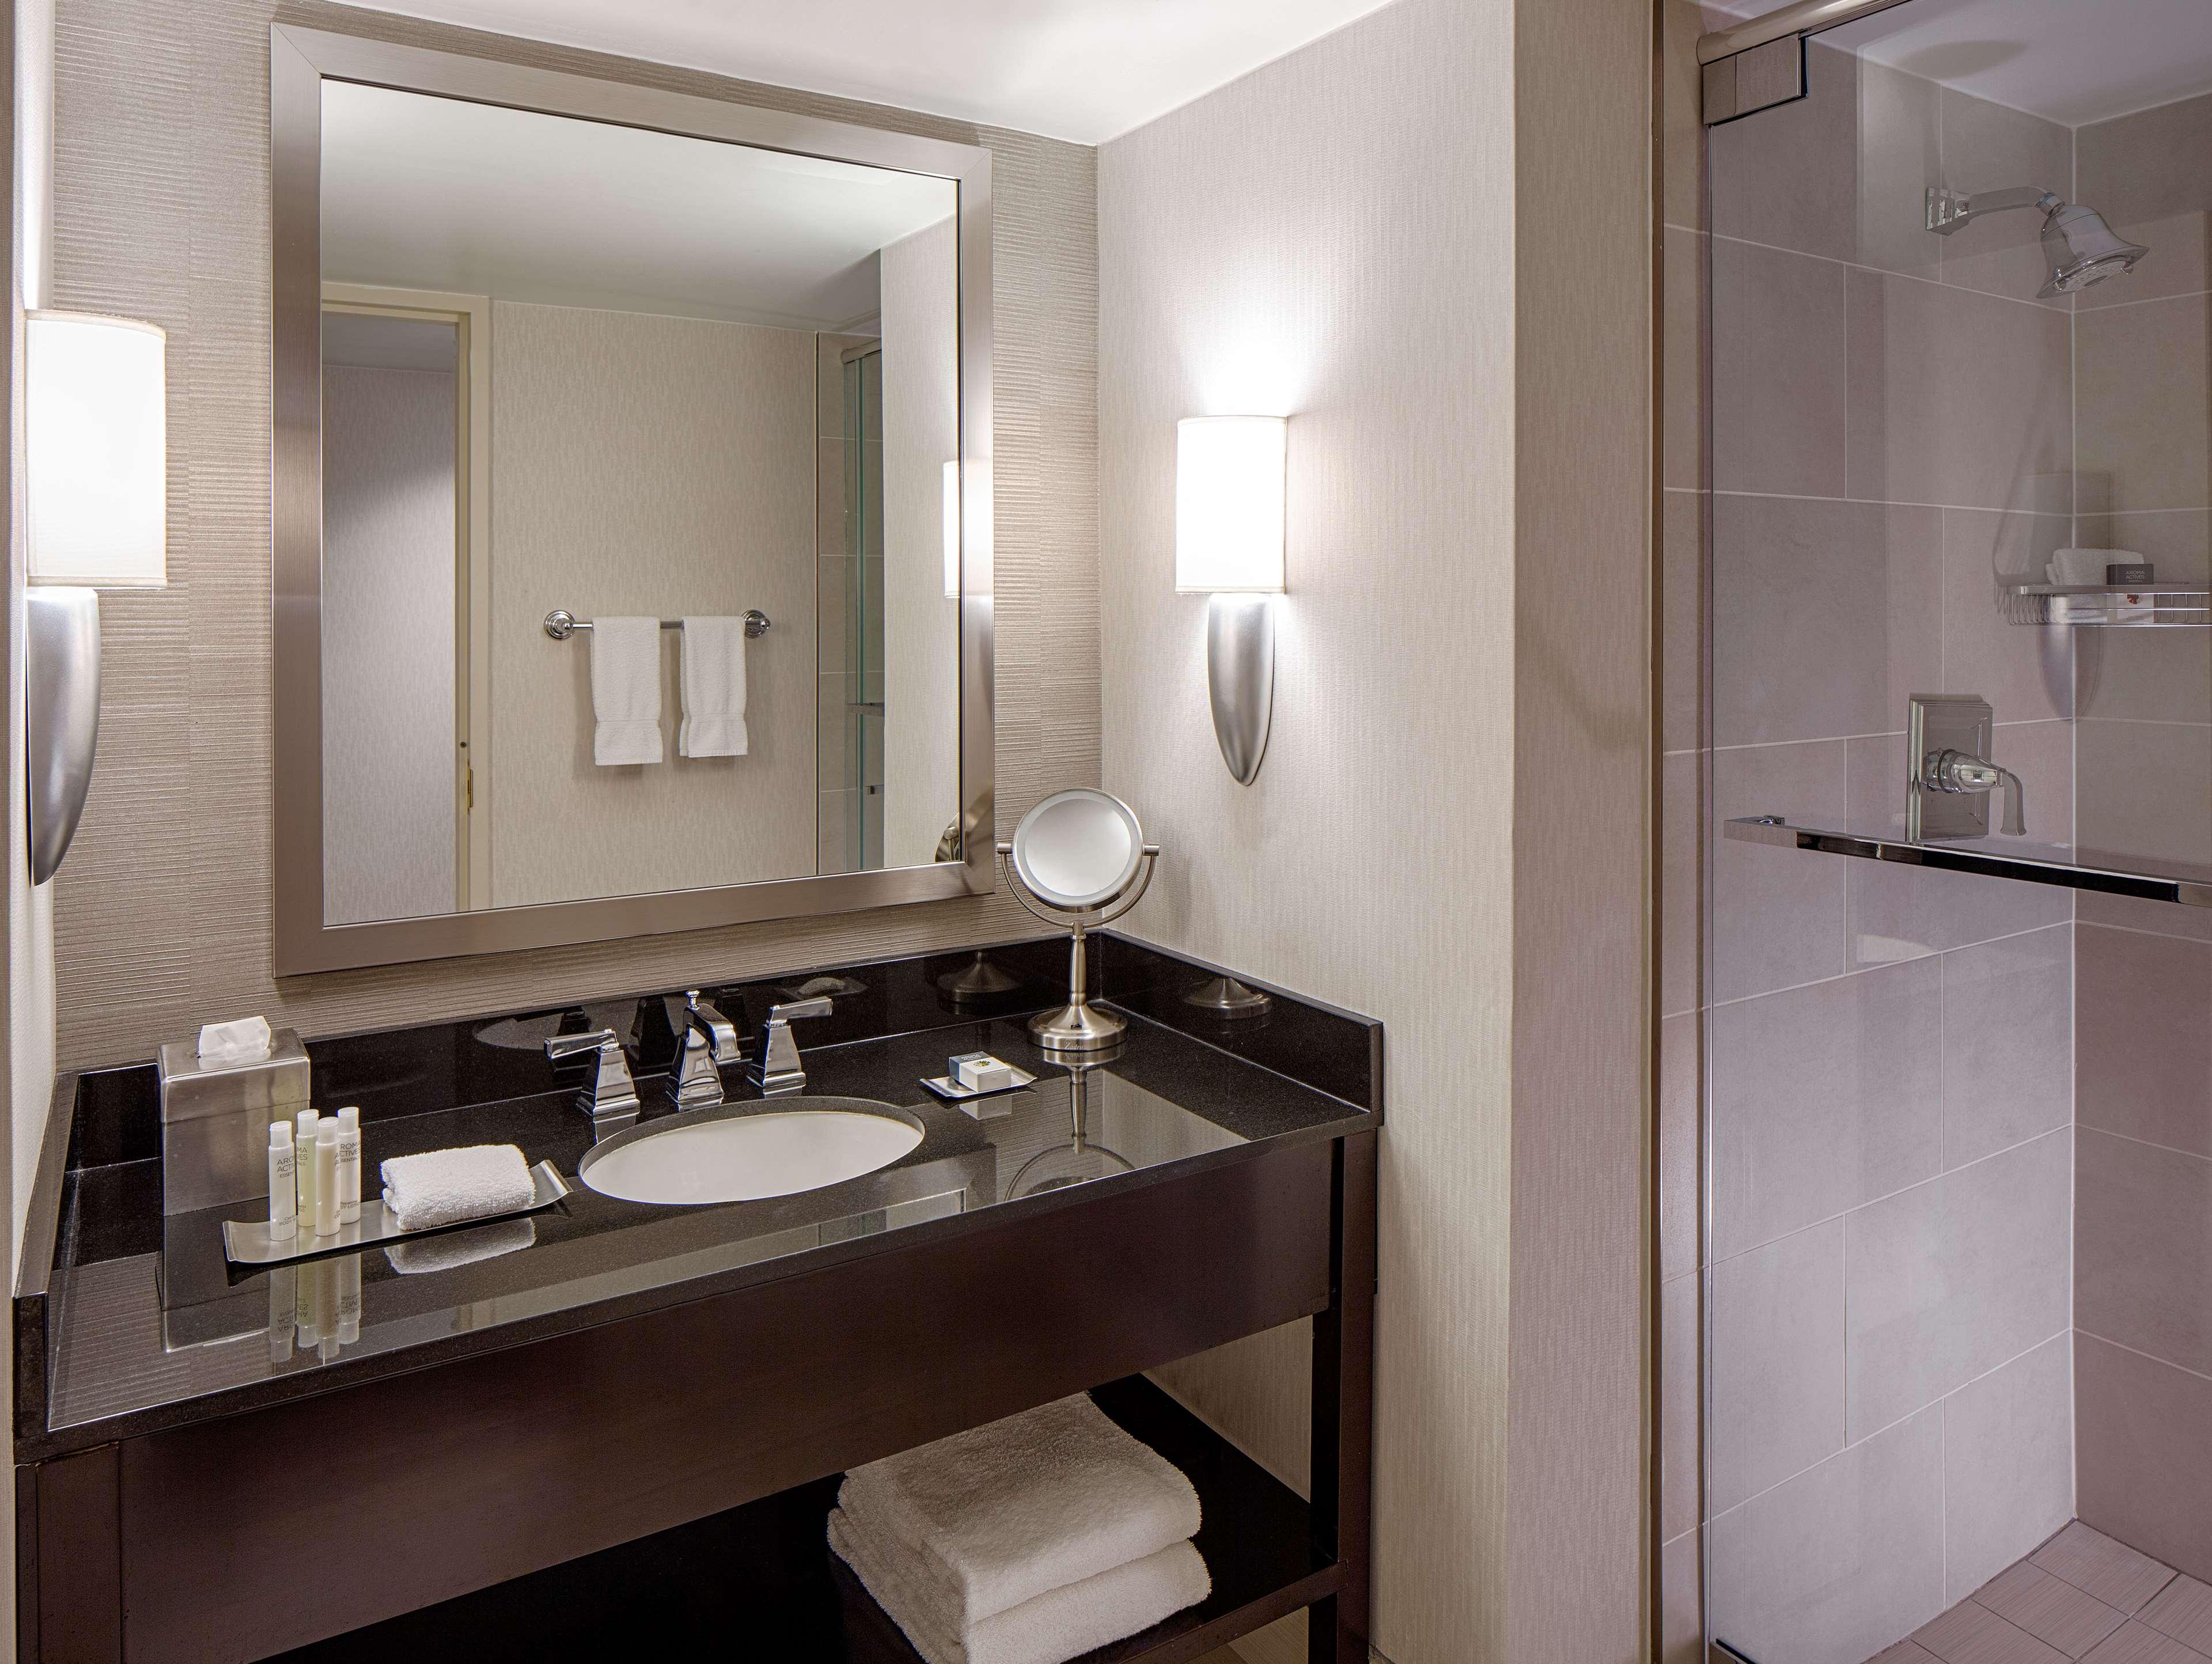 DoubleTree by Hilton Hotel Houston - Greenway Plaza image 19